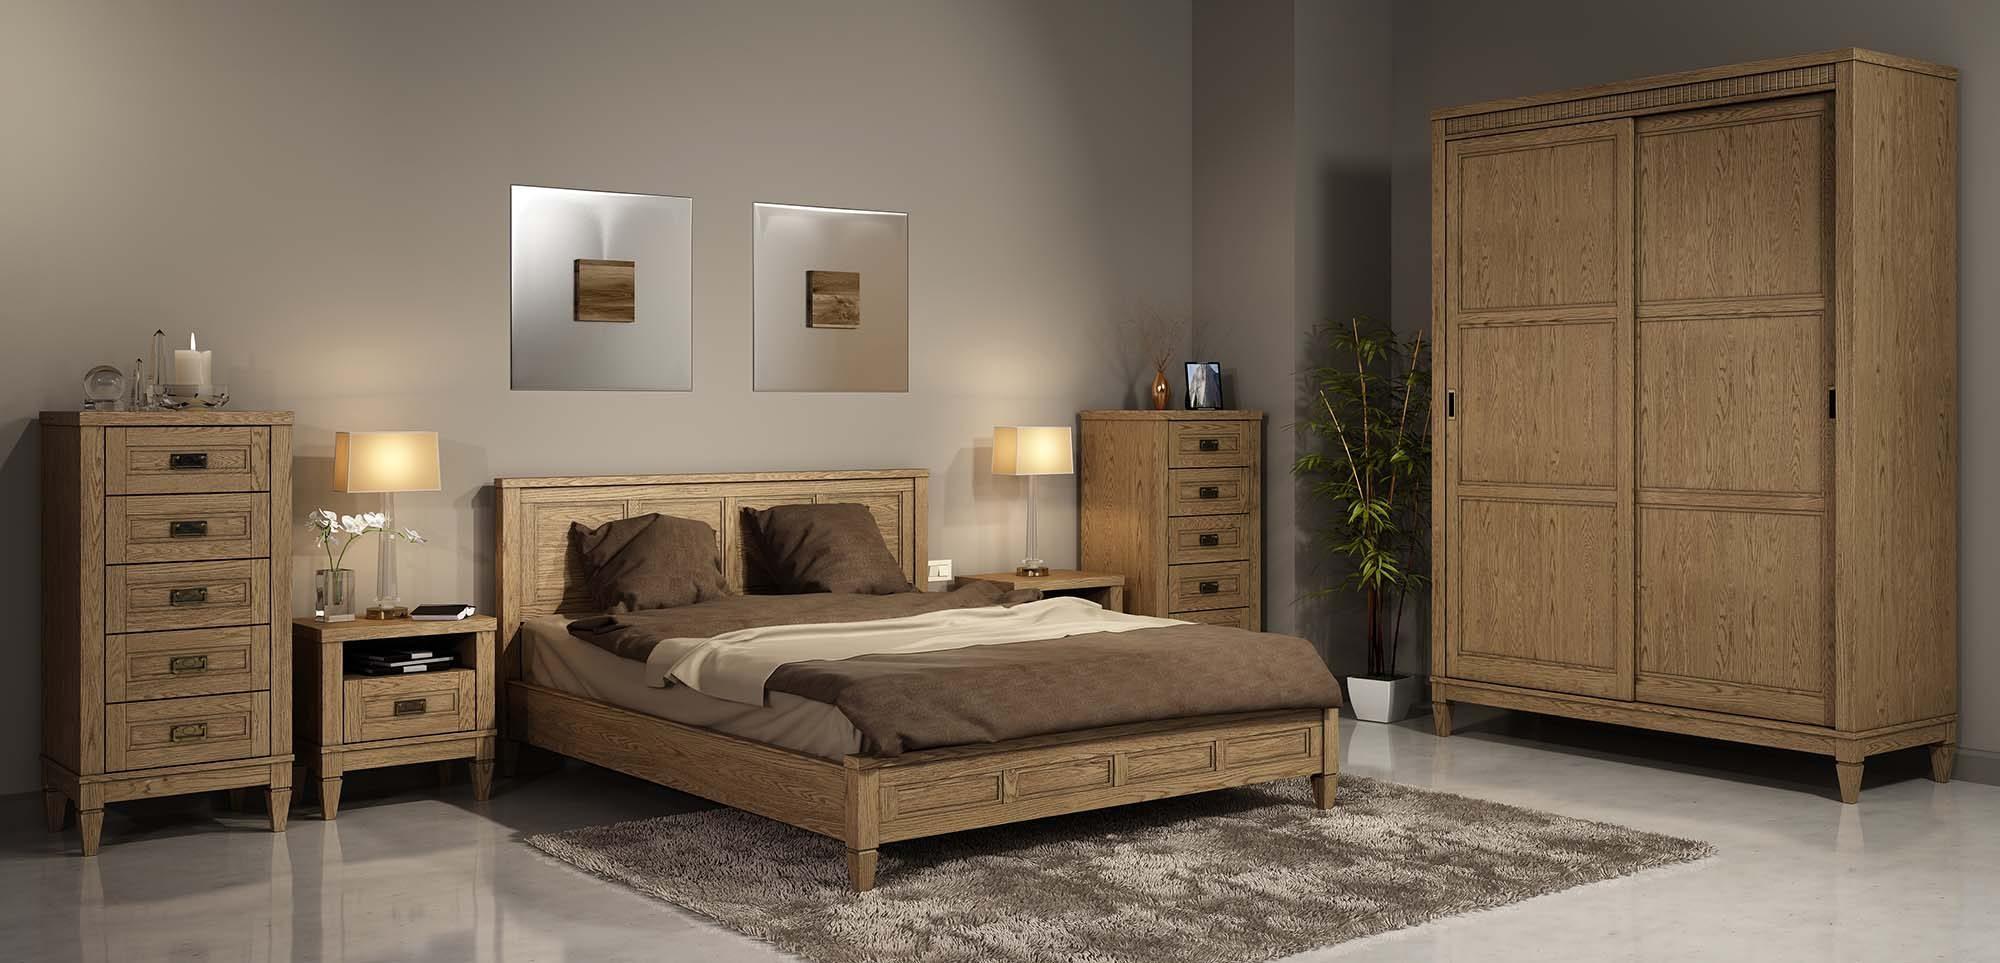 bavaria_bedroom-1-e1500456386783